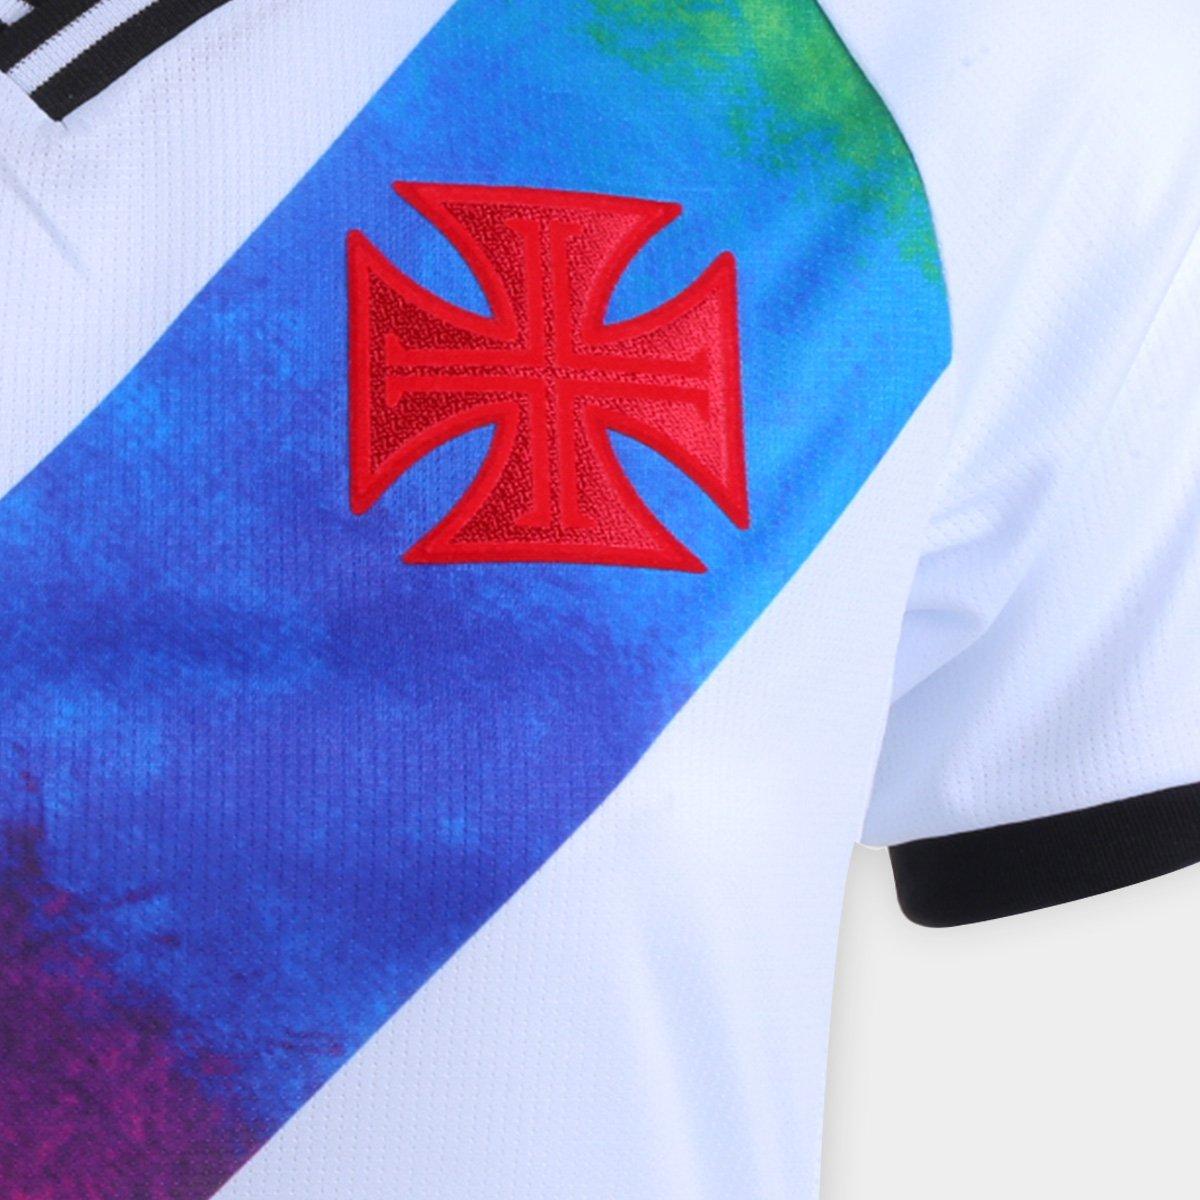 Camisa Oficial Vasco da Gama LGBTQIA+ 21/22 Feminina Branca